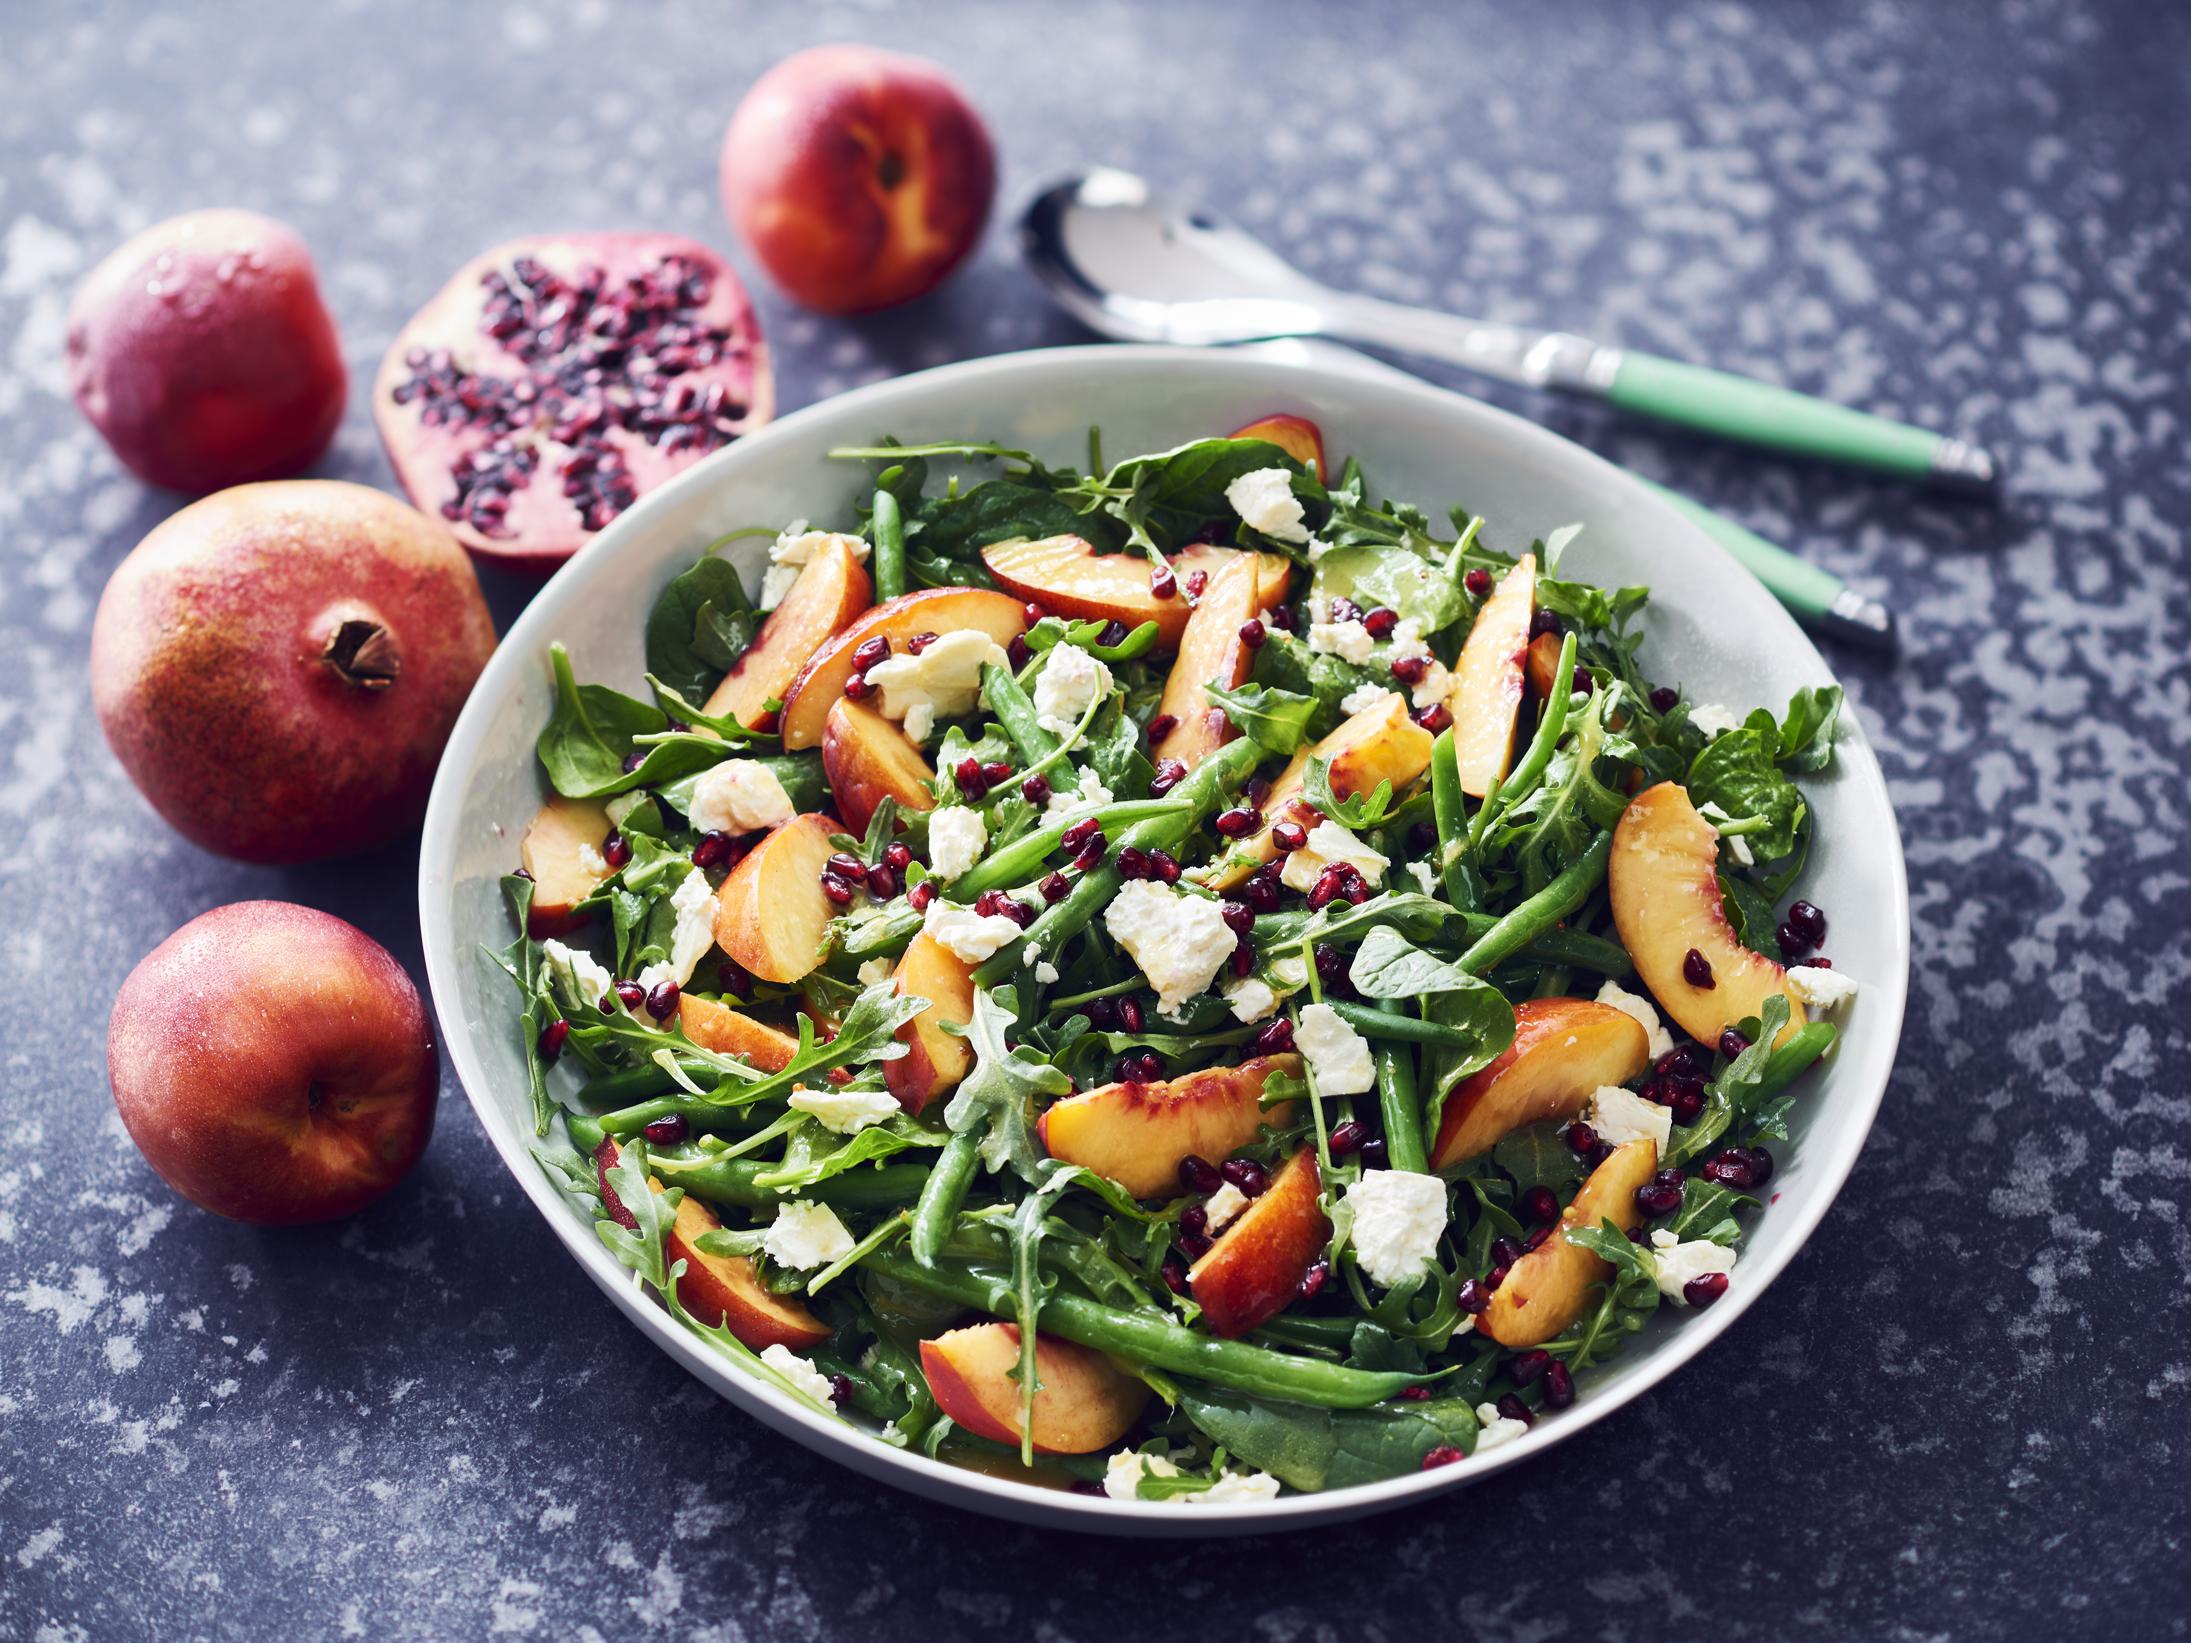 Rocket, Spinach and Nectarine Salad